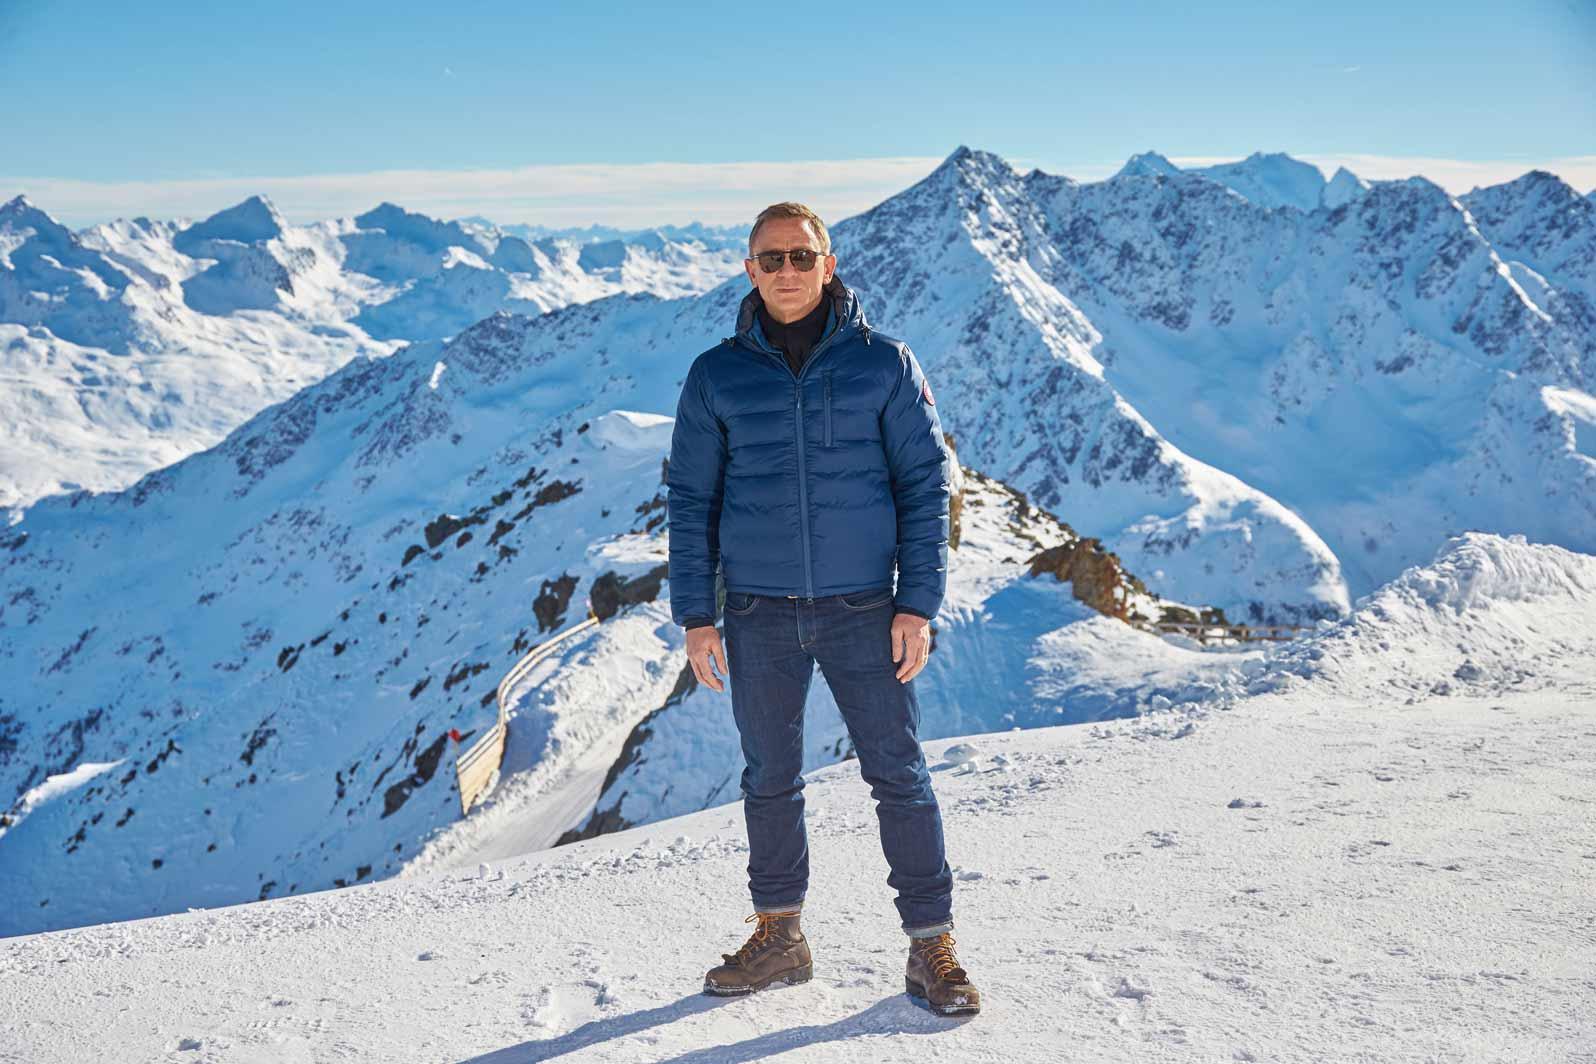 daniel-craig-james-bond-snow-look-spectre-jeans-jacket